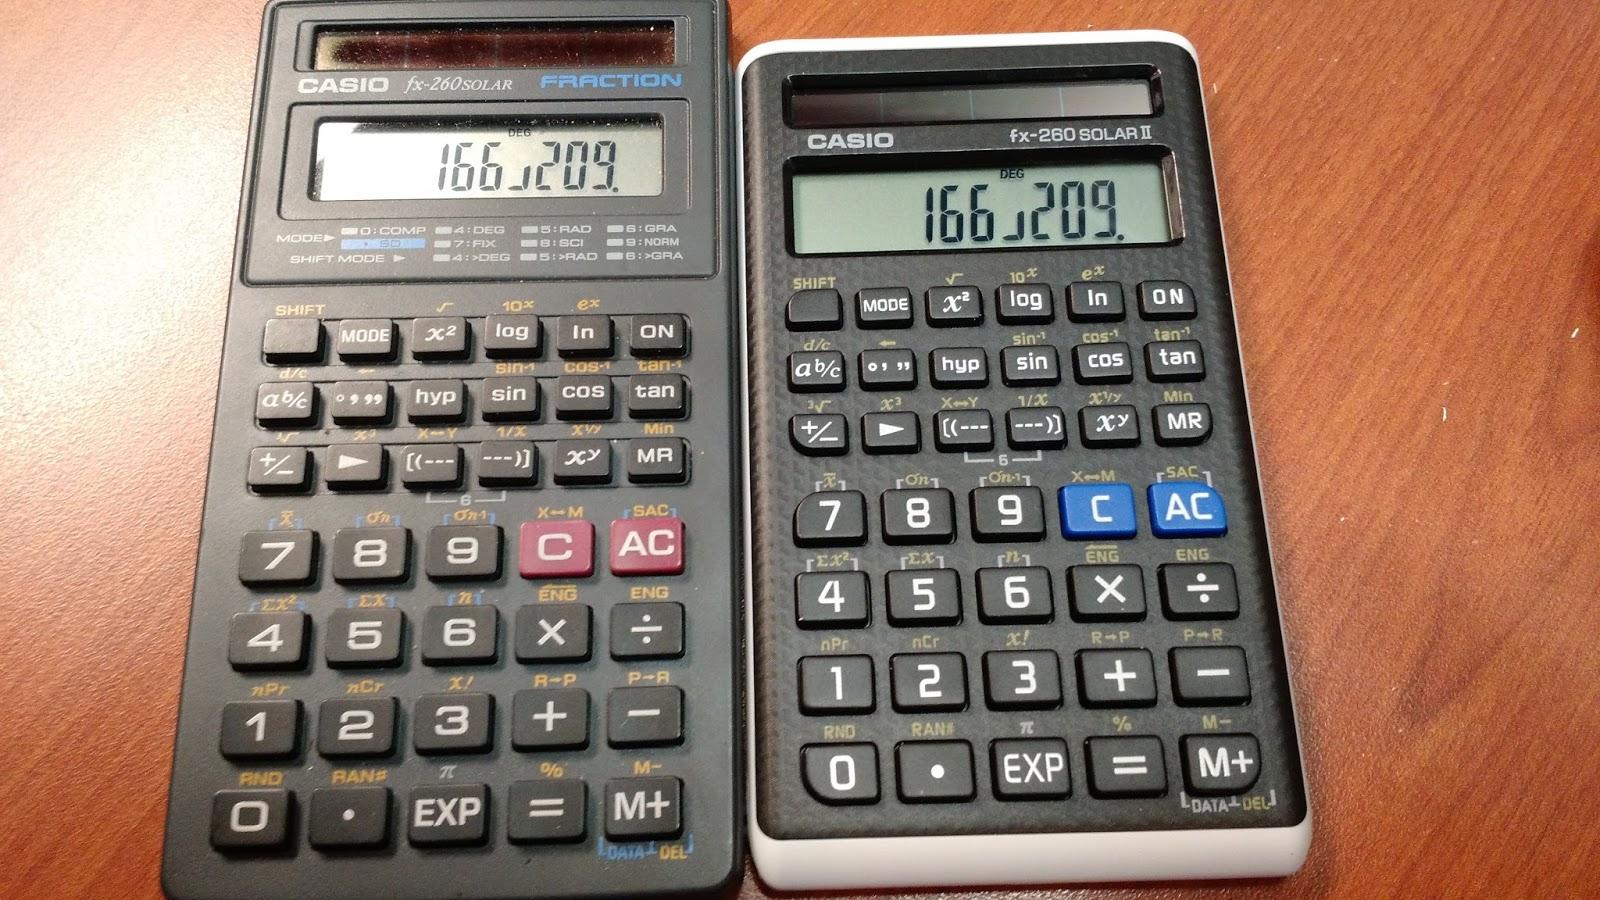 Eddies math and calculator blog review casio fx 260 solar ii fx fx 260 solar original on the left fx 260 solar ii on the right named fx 82 solar ii internationally ccuart Choice Image